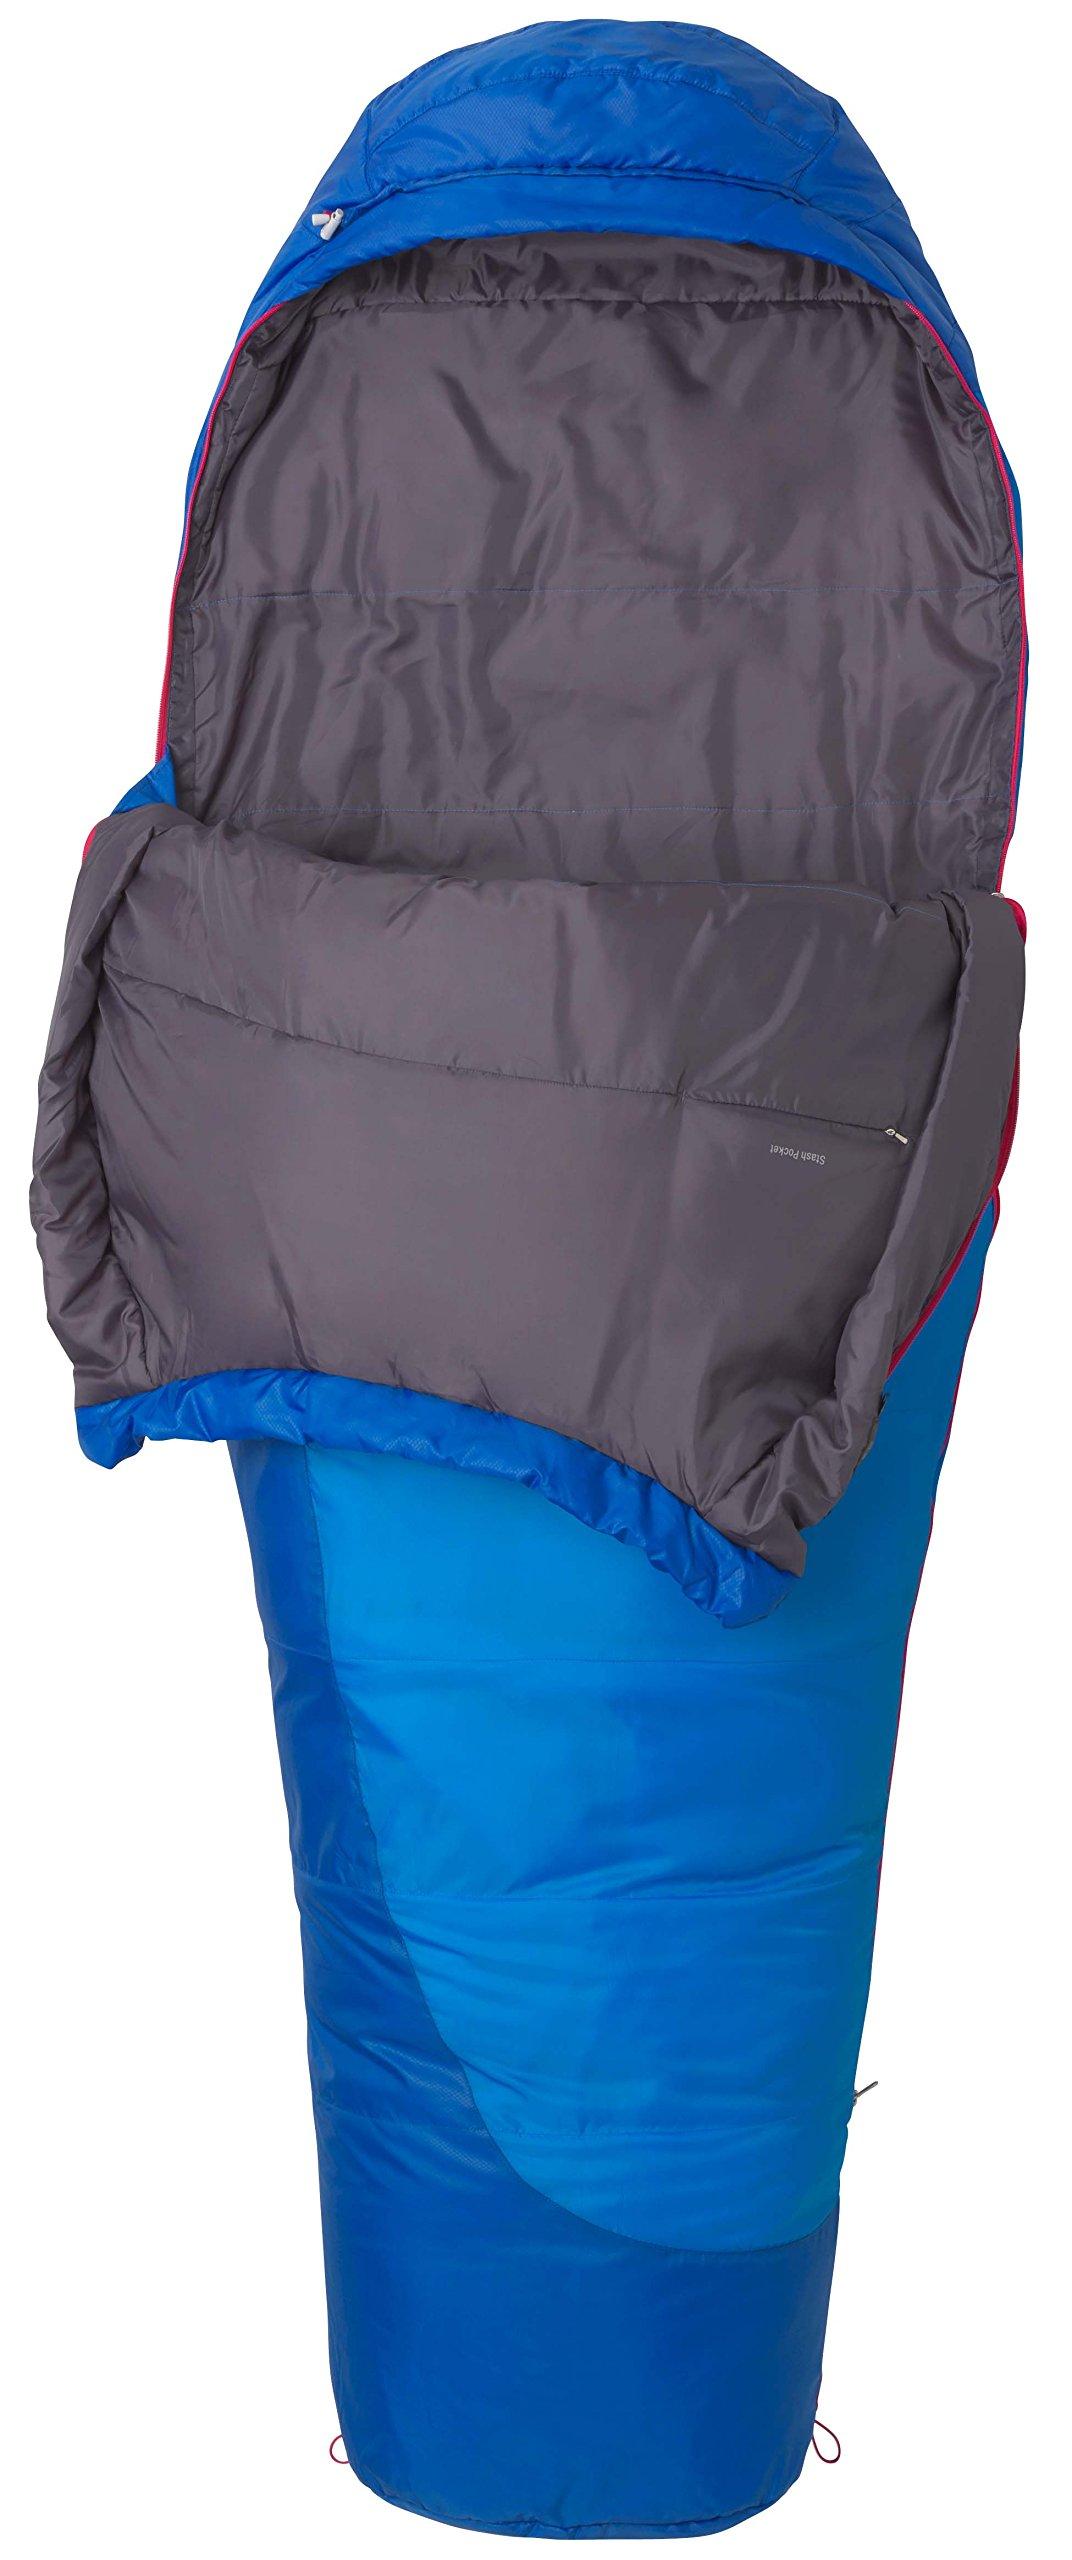 Marmot Trestles 15 Womens Cold Weather Mummy Sleeping Bag 15 Degree Rating